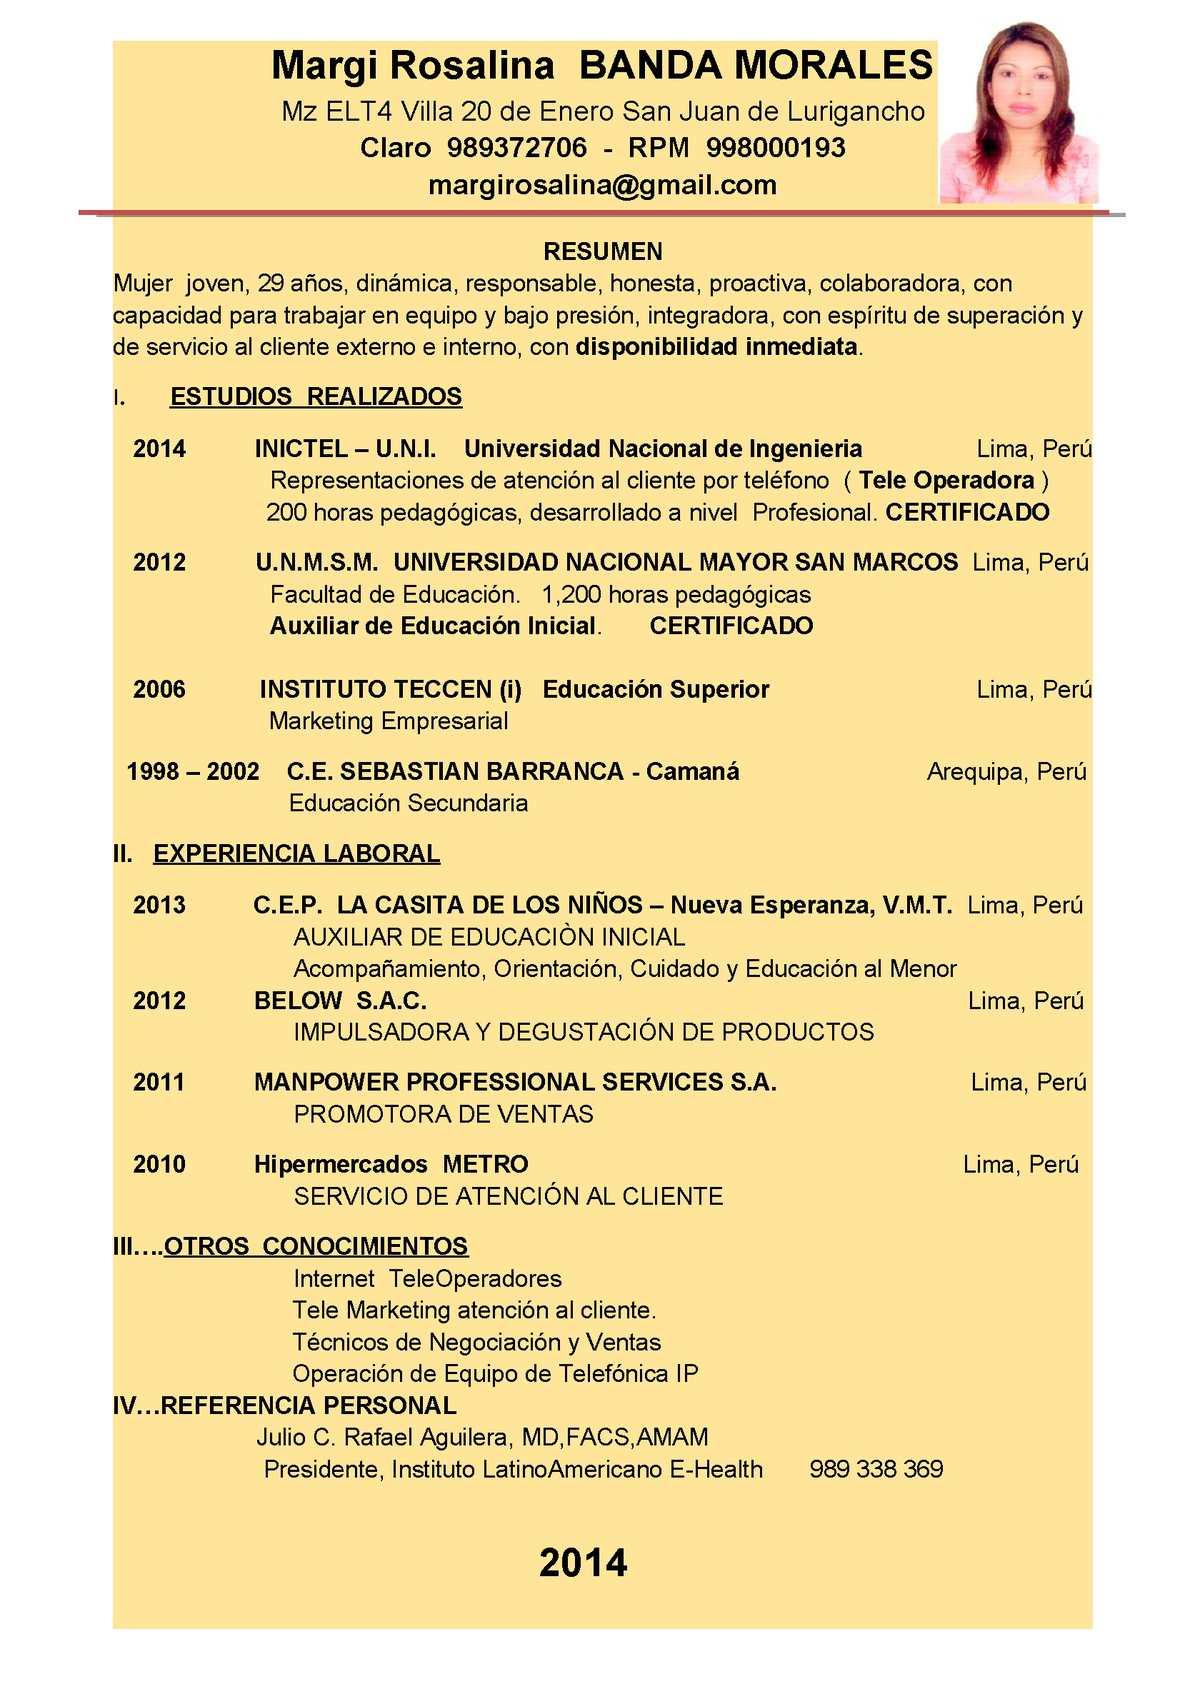 Calaméo - Curriculum Vitae Margi Rosalinda Banda Morales